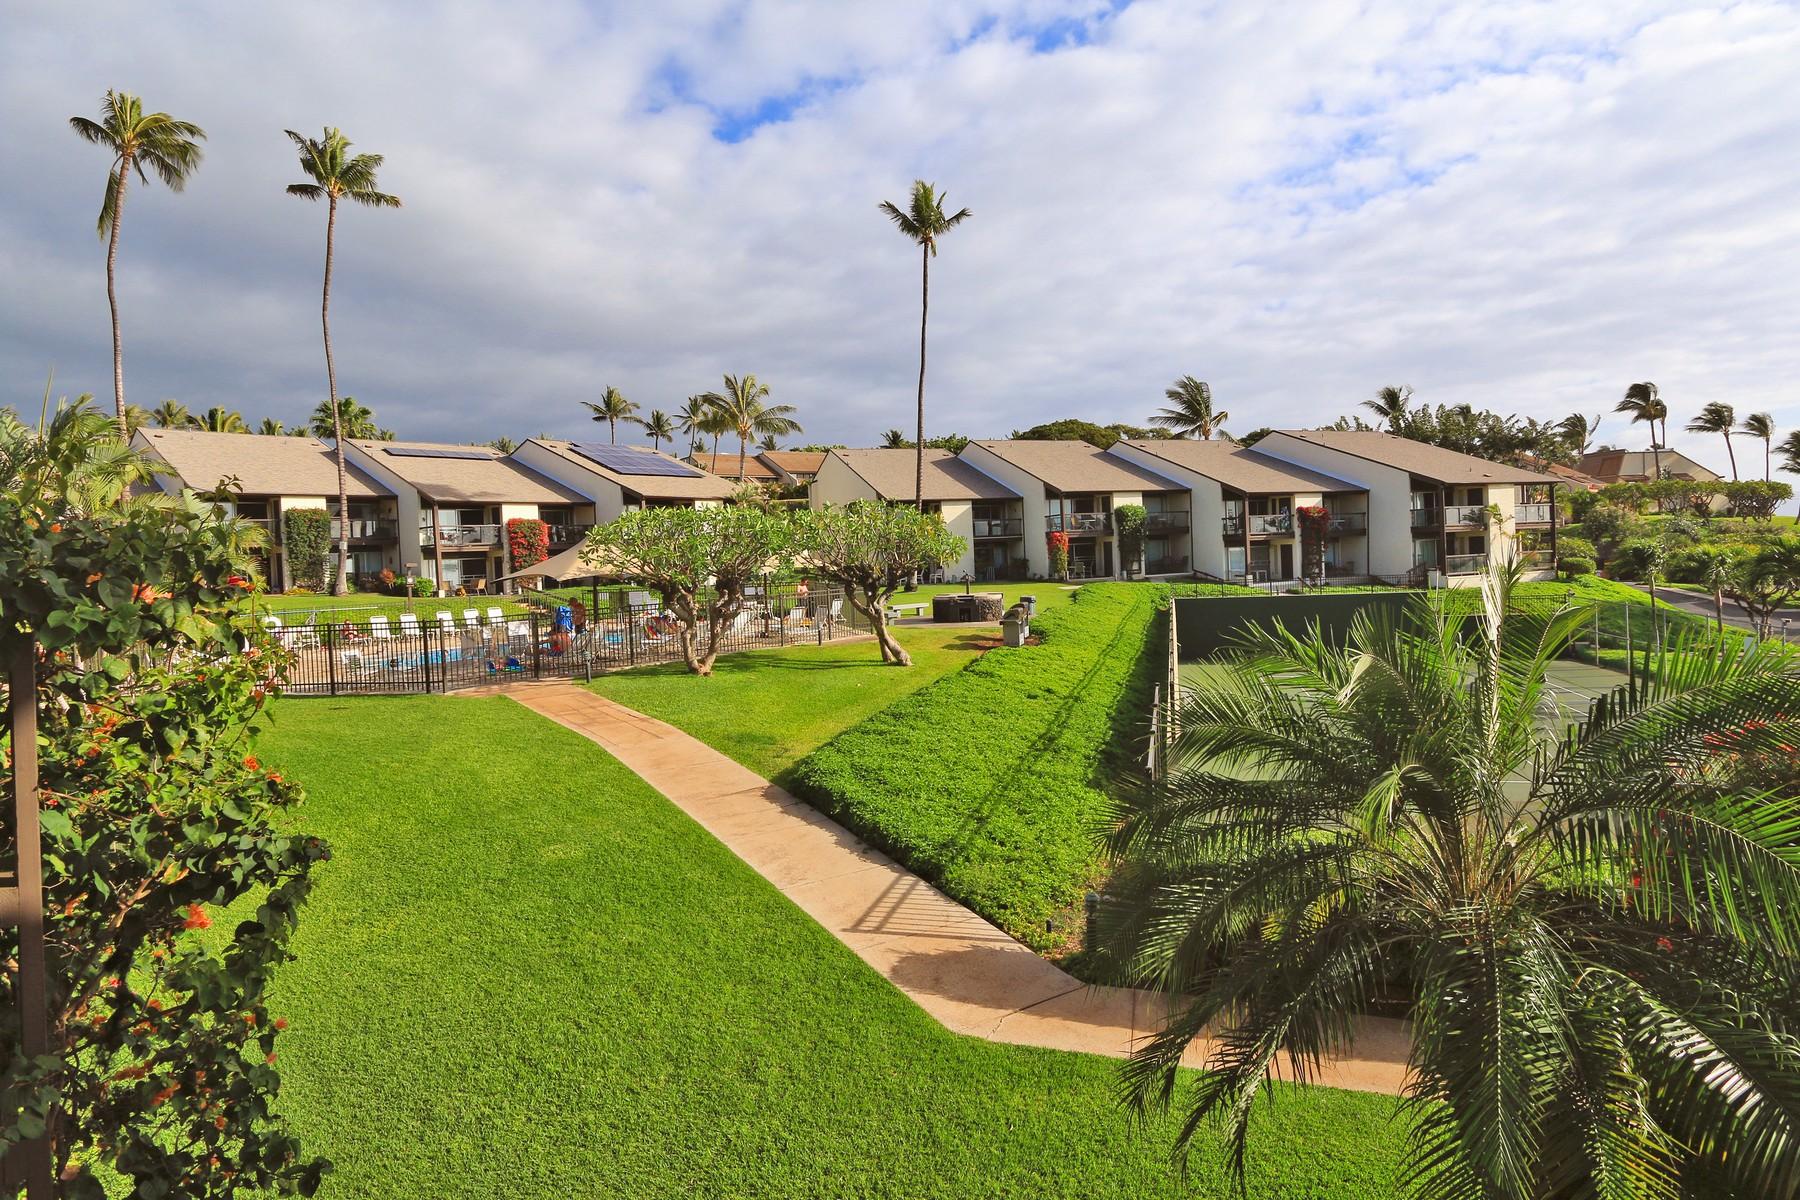 Condomínio para Venda às South Kihei Vacation Rental Winner 2737 South Kihei Road, Hale Kamaole 231 Kihei, Havaí, 96753 Estados Unidos